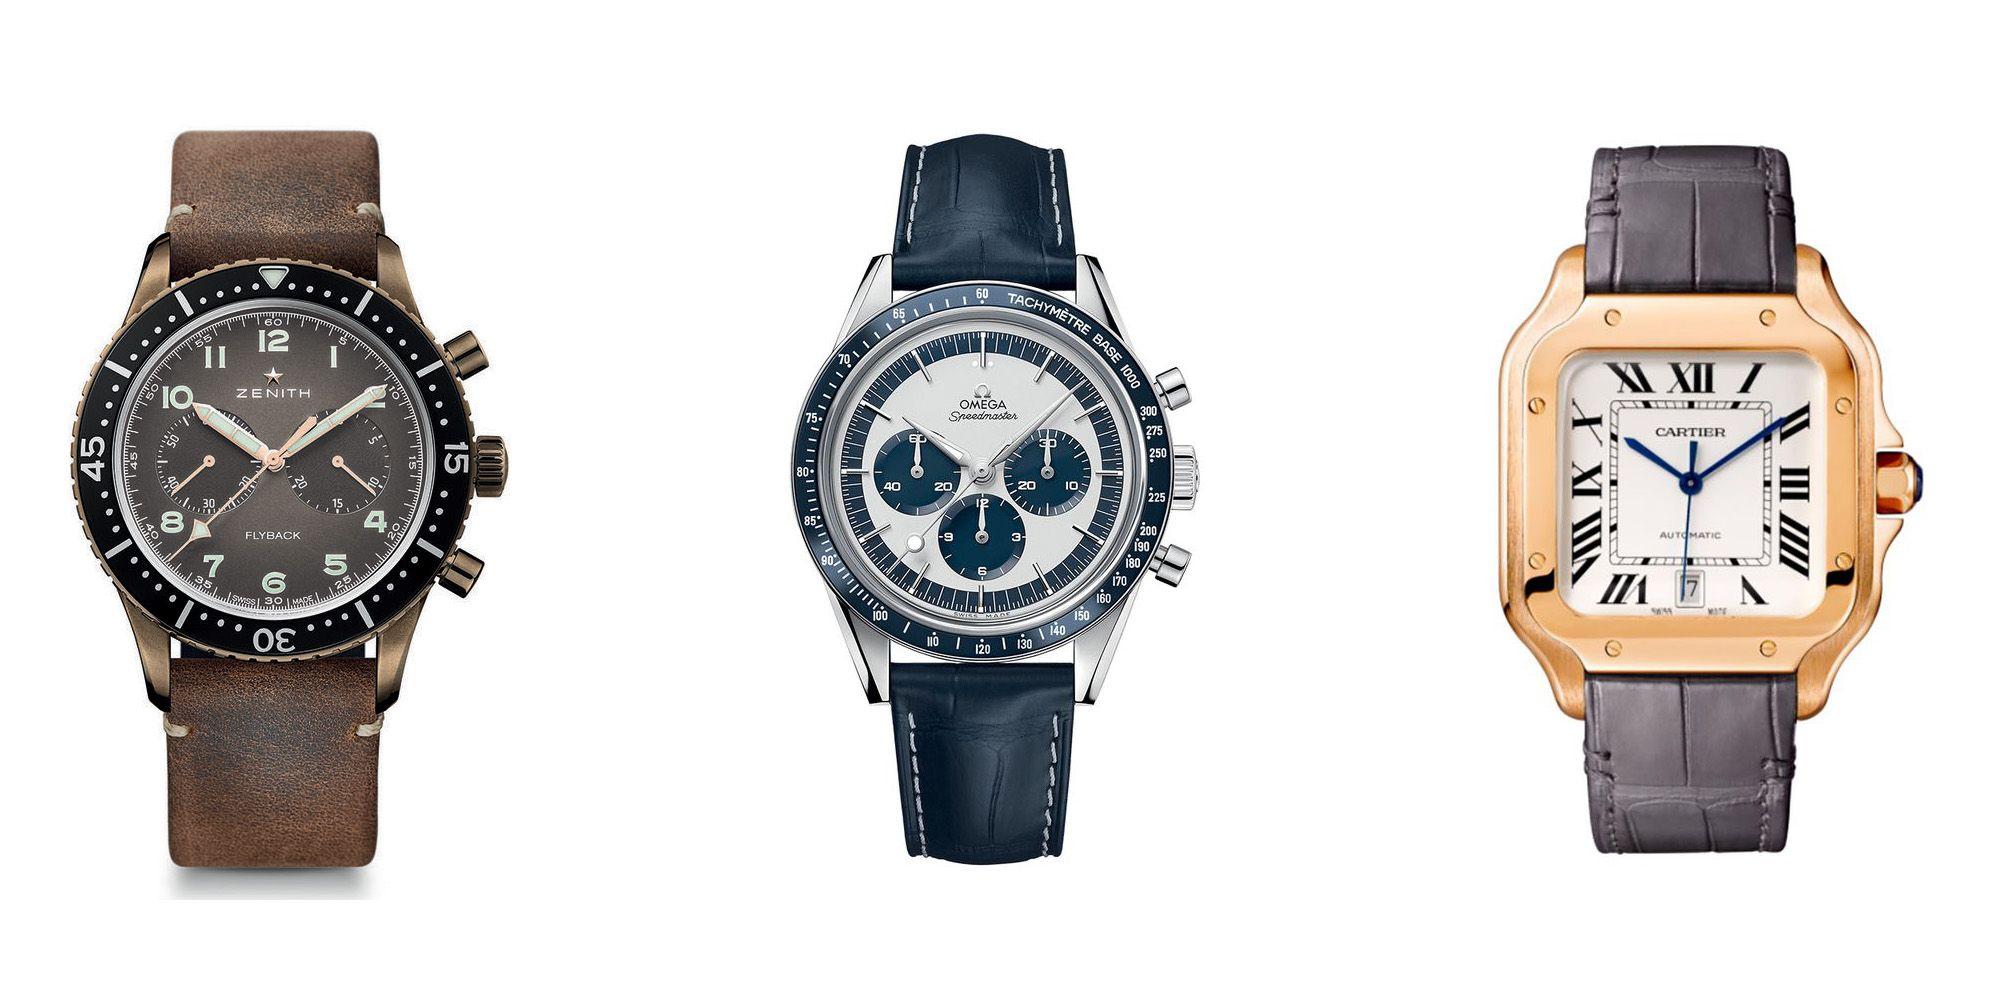 99bd9e5b9b3de The Best Luxury Watches Of 2018